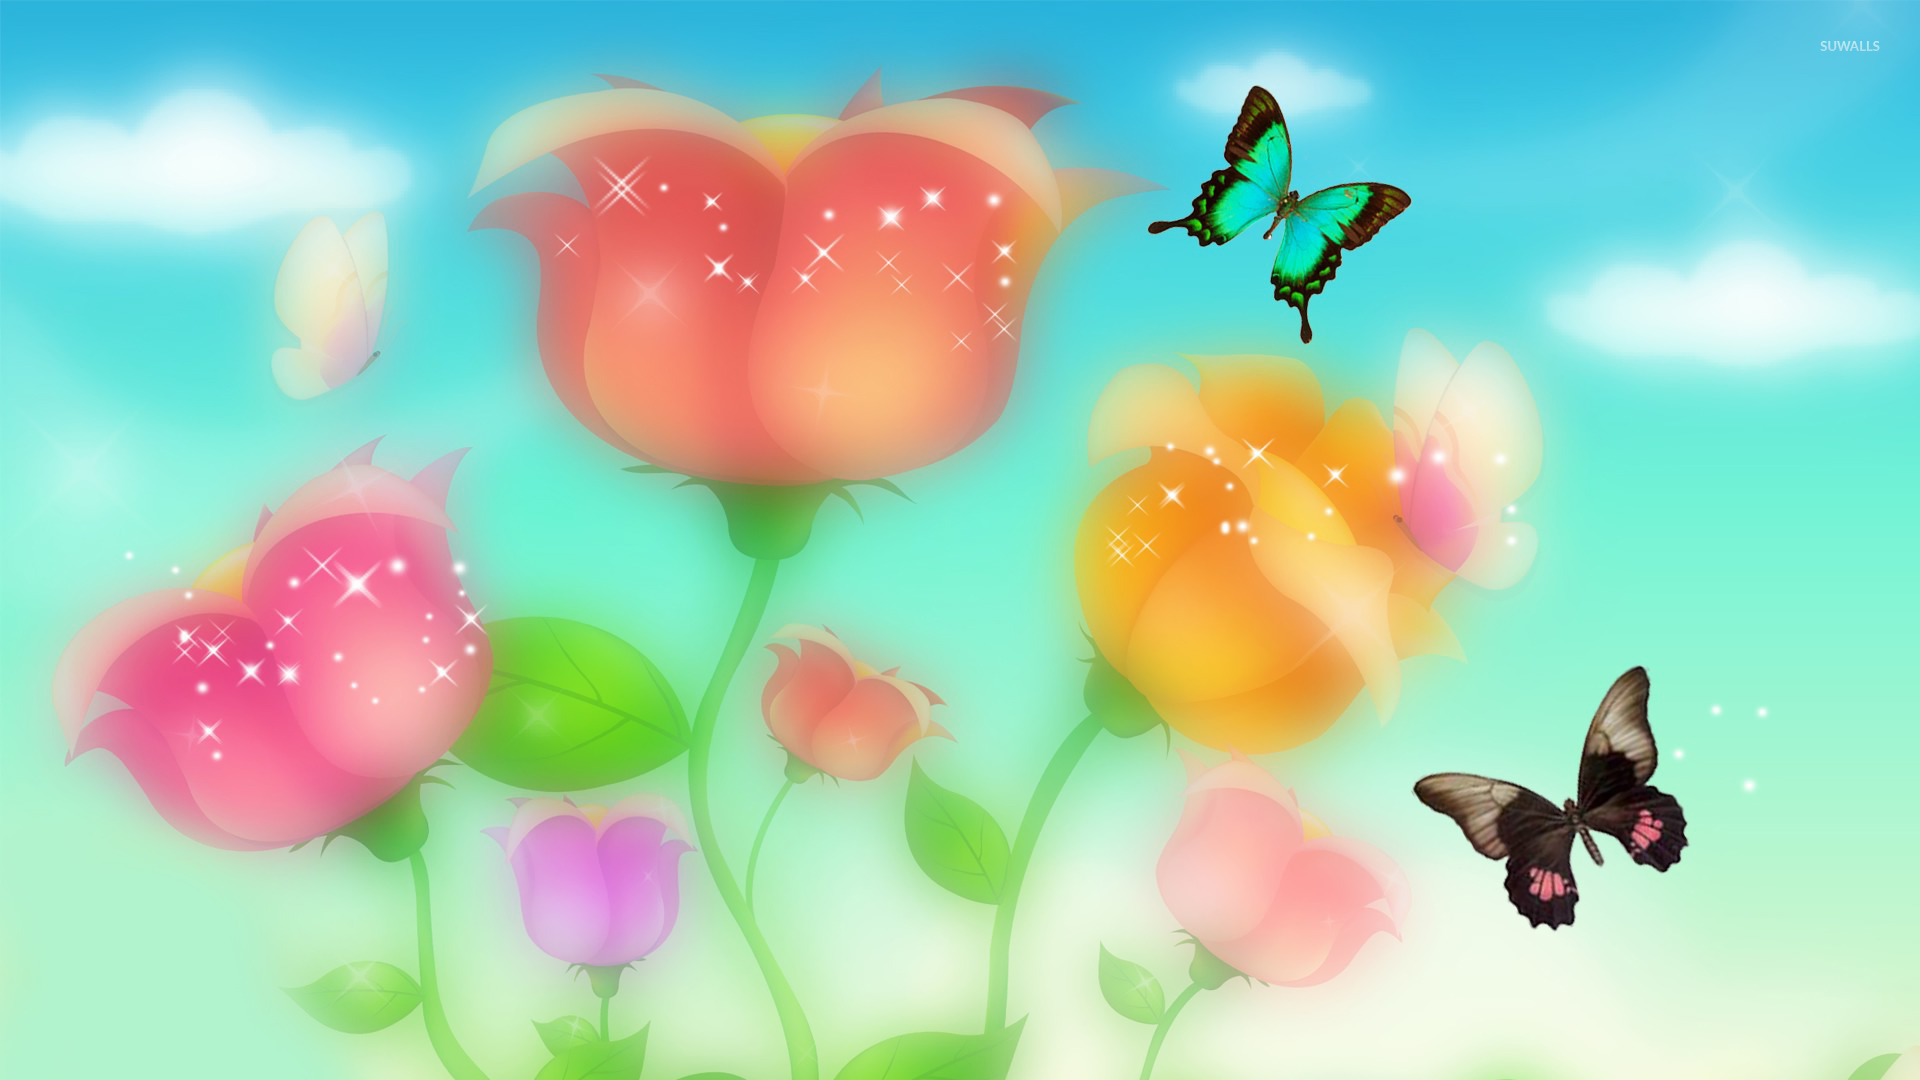 Sparkling roses and butterflies wallpaper   Digital Art wallpapers 1920x1080